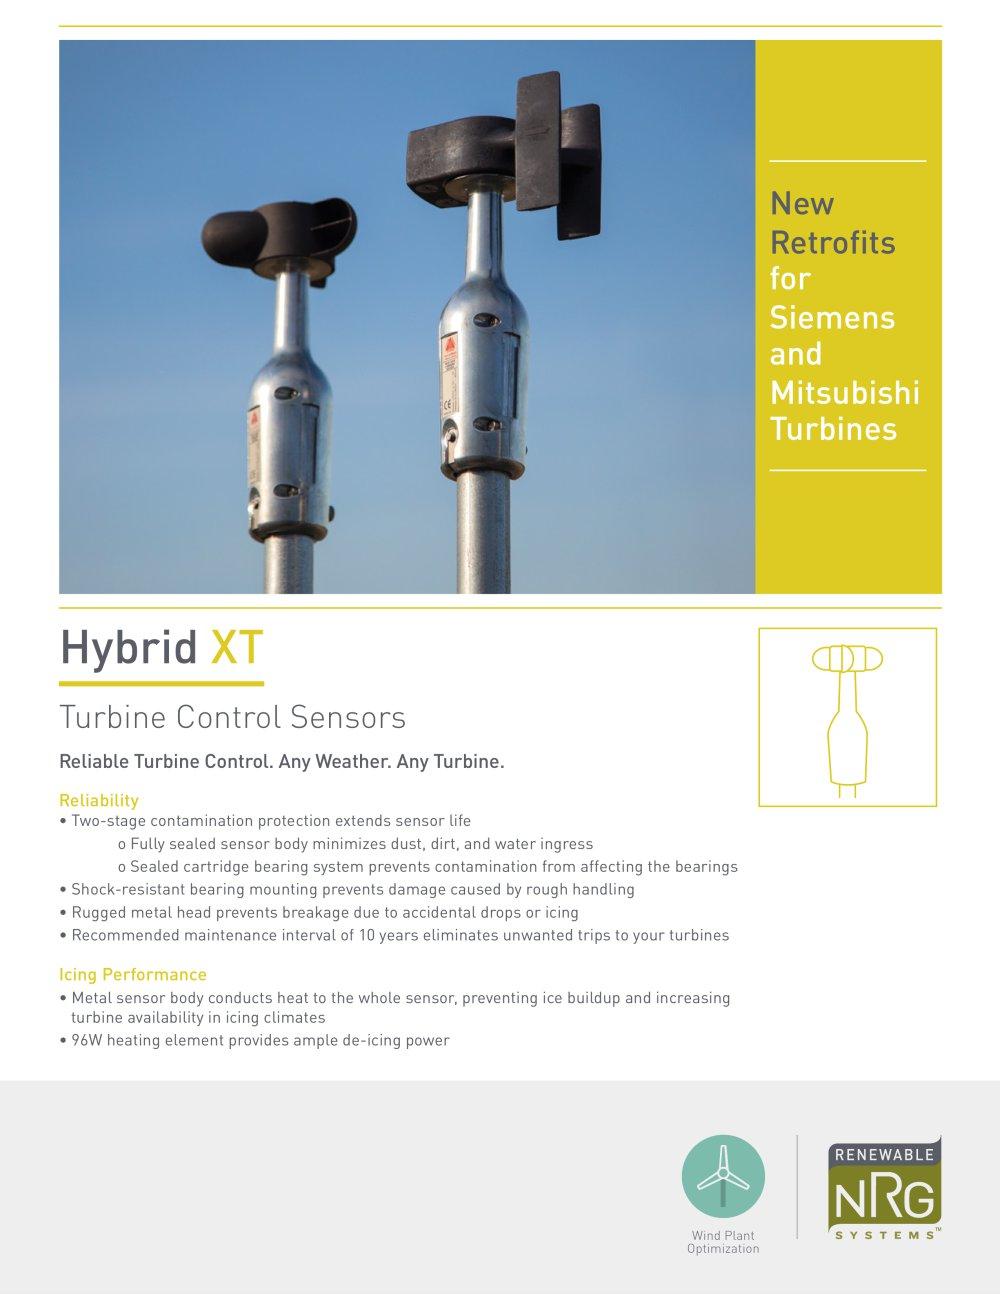 HYBRID XT TURBINE CONTROL SENSORS - NRG Systems - PDF Catalogue ...